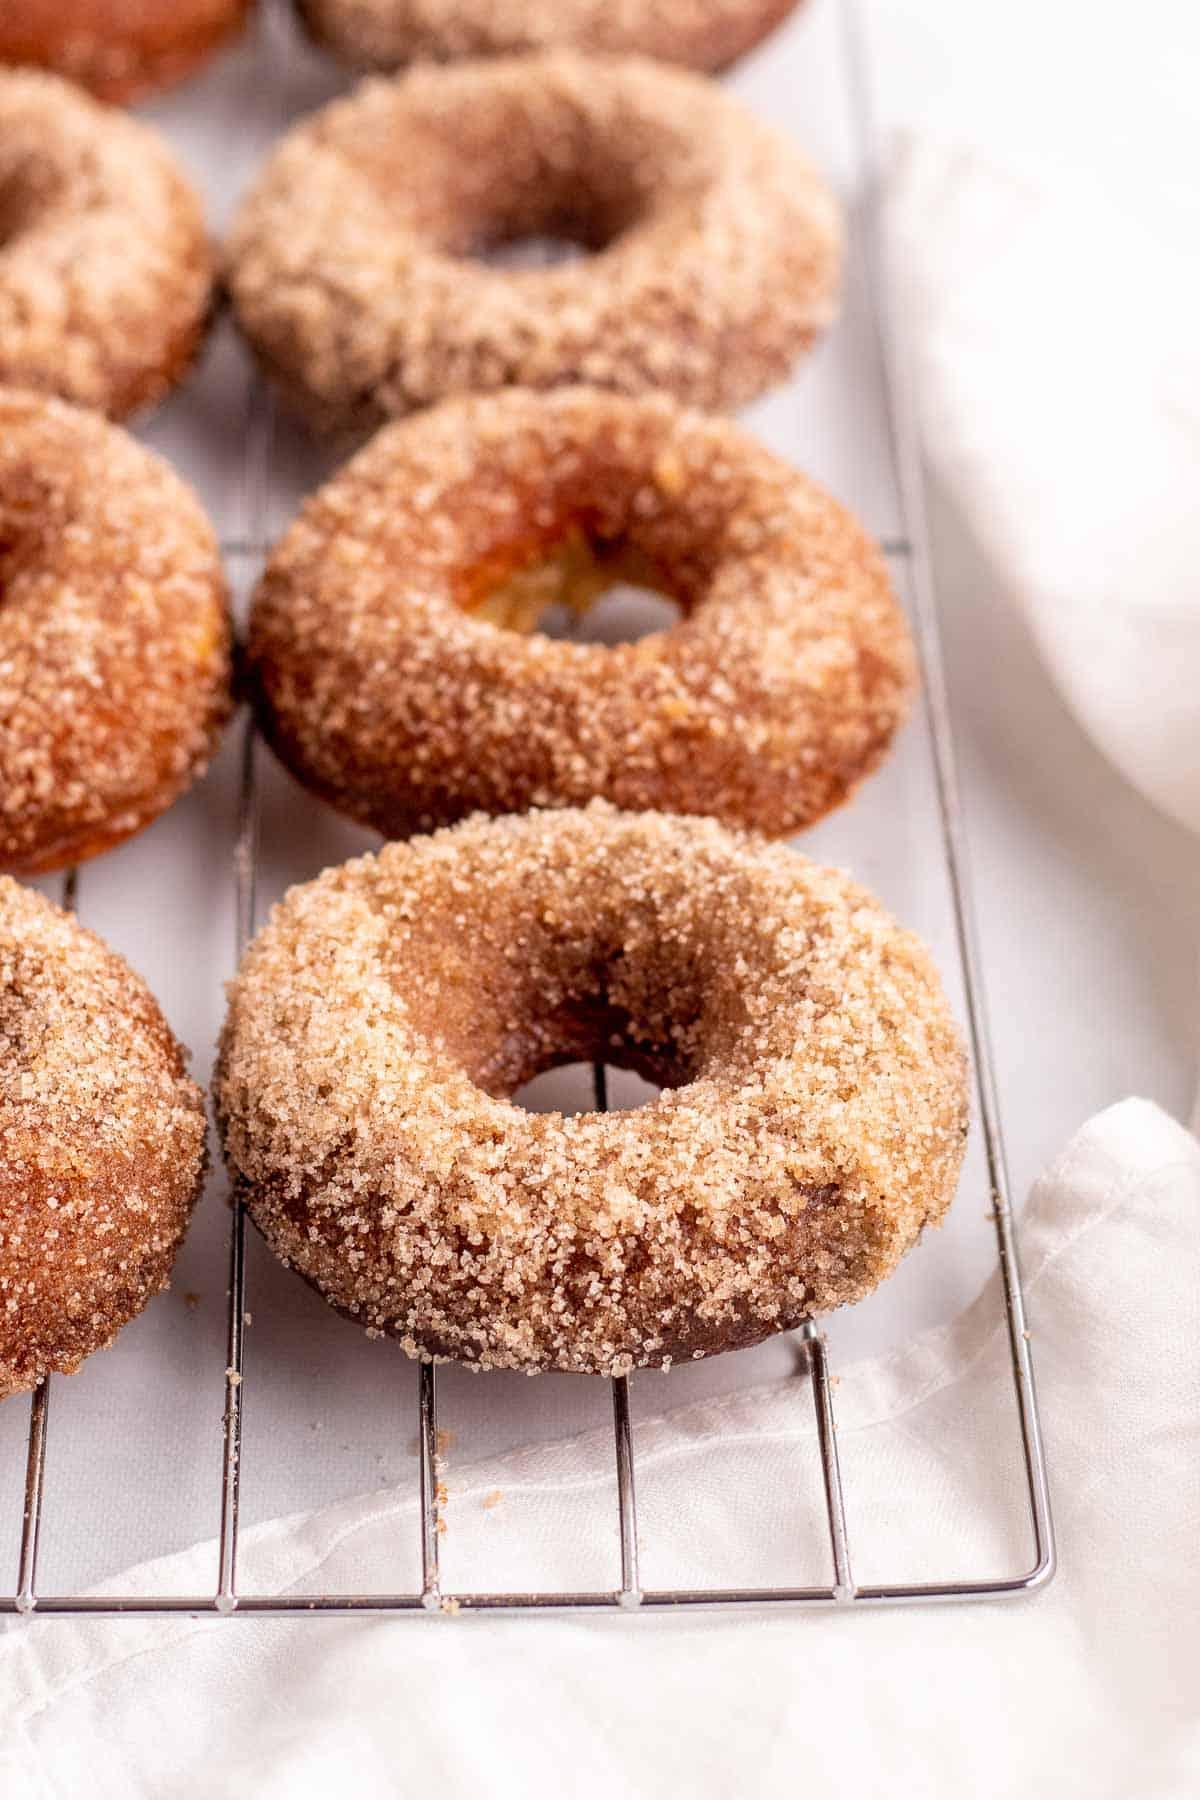 Closeup of cinnamon sugar donuts on a cooling rack